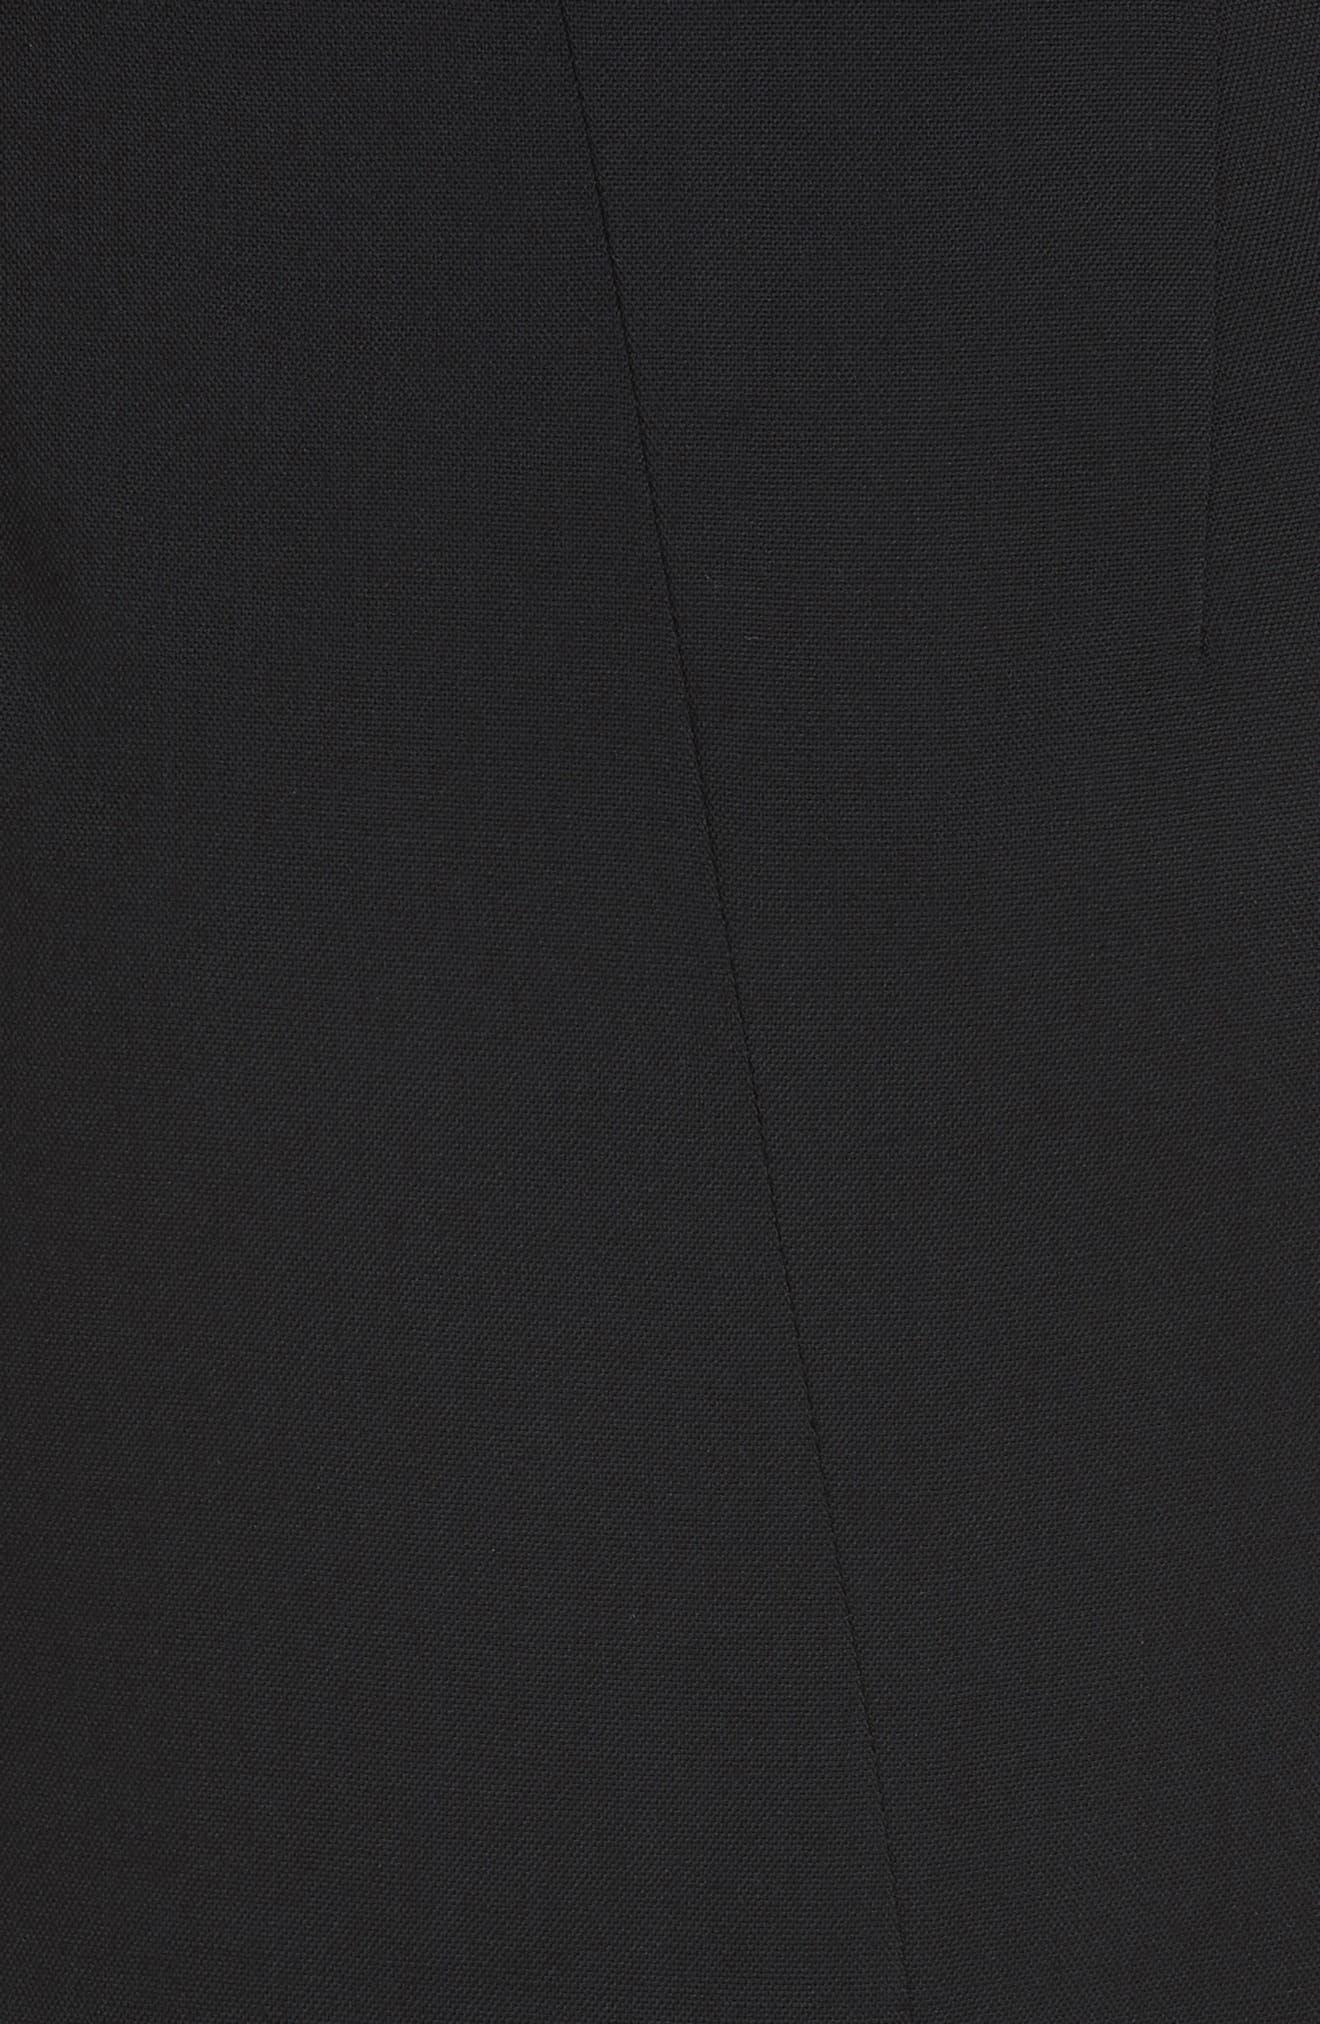 Button Detail Slit Stretch Wool Pencil Skirt,                             Alternate thumbnail 5, color,                             001 BLACK